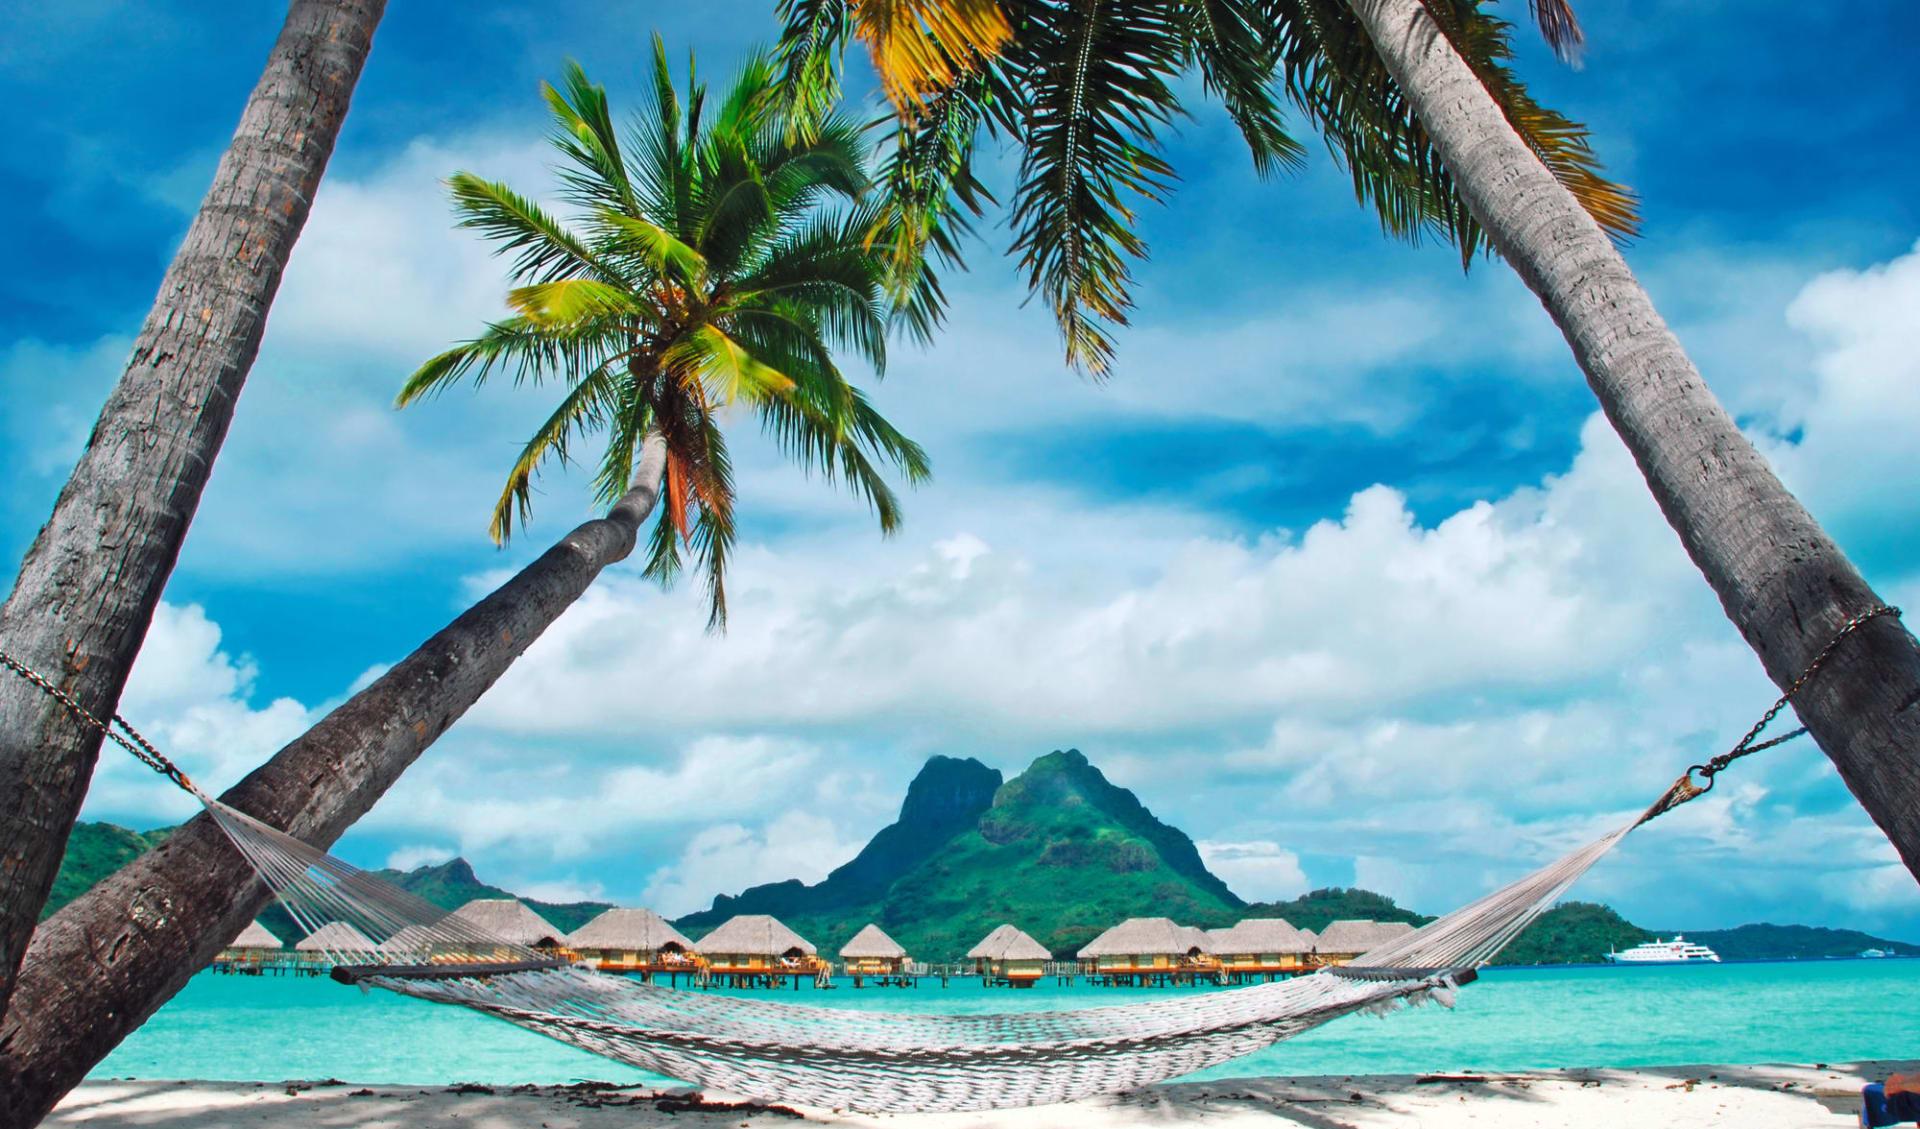 Traumhafte Südsee-Inseln ab Papeete: Bora Bora, Mont Otemanu